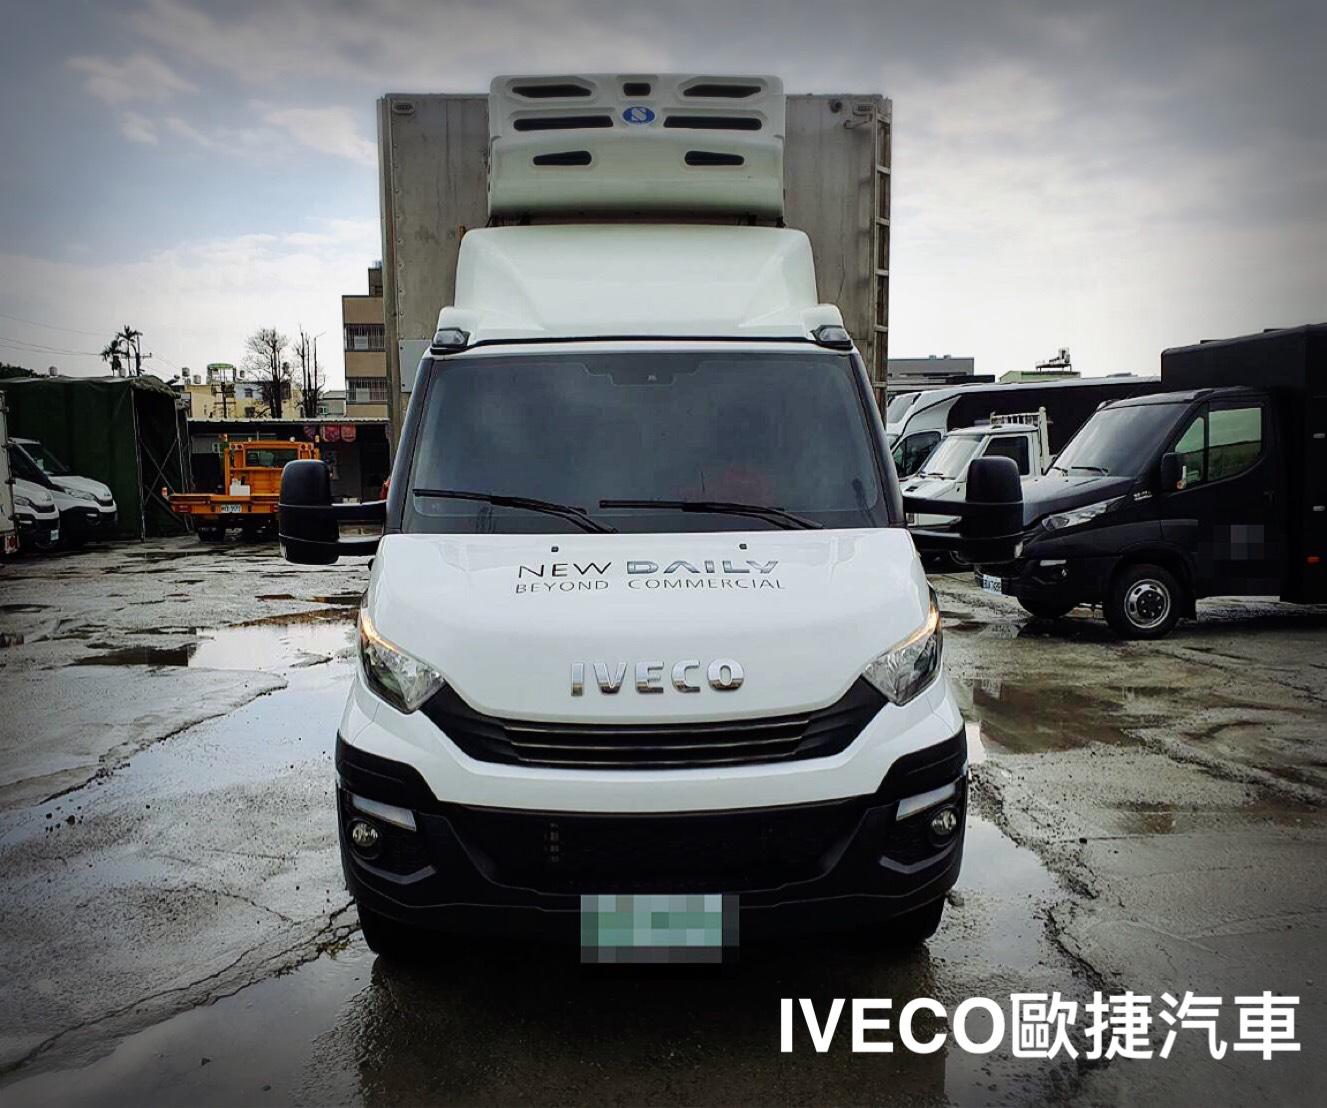 IVECO 鋁合金貨車廂車體改裝